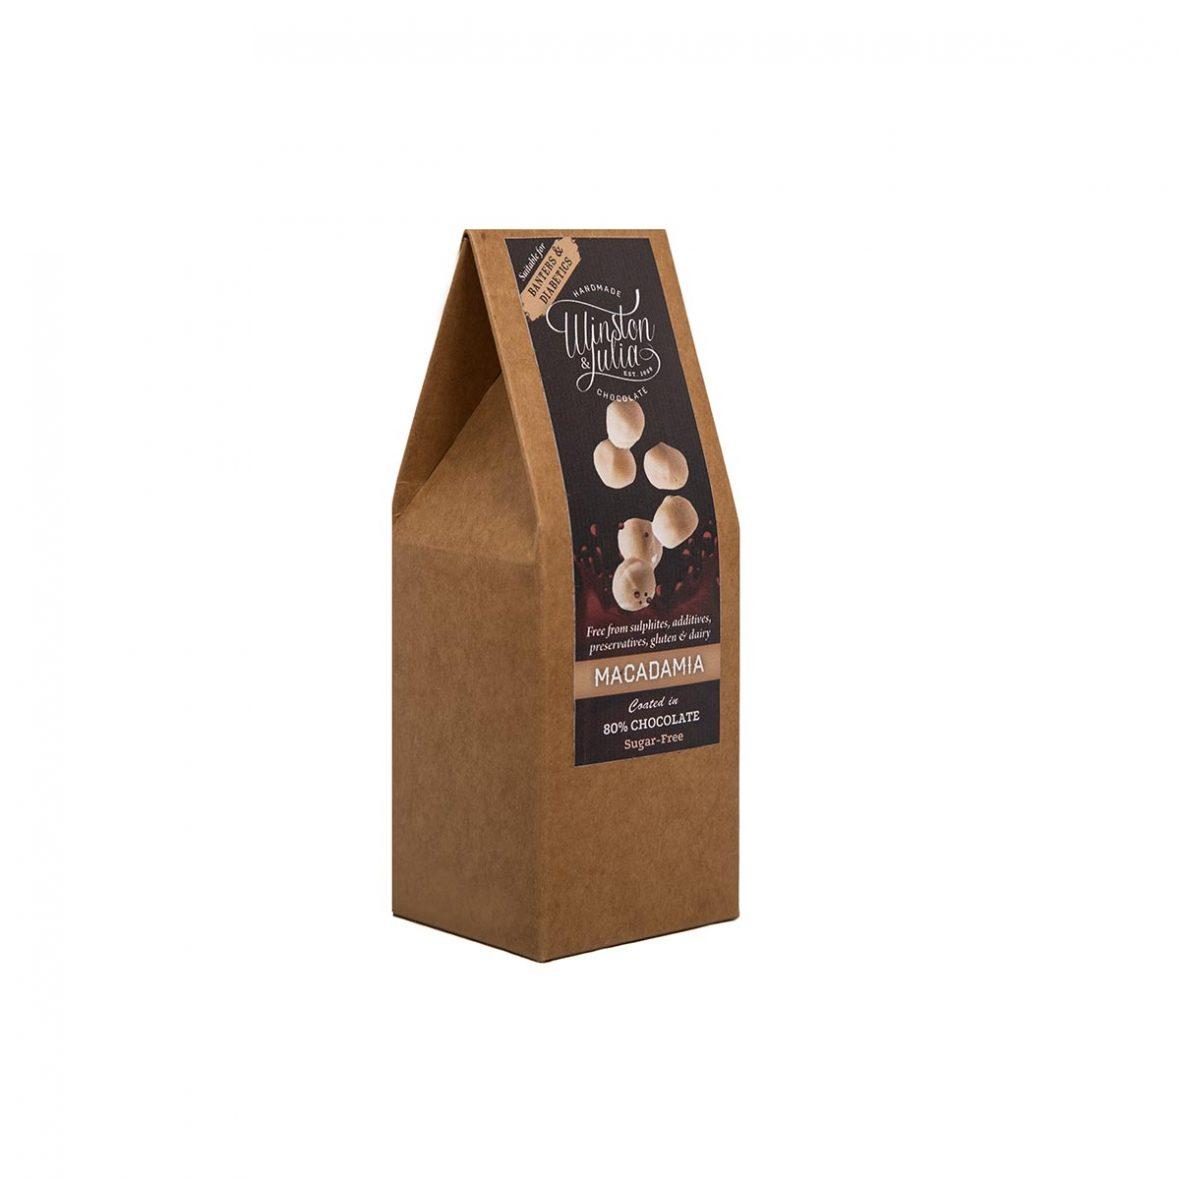 Macadamia Nuts 80% Sugar Free Chocolate Natural Collection